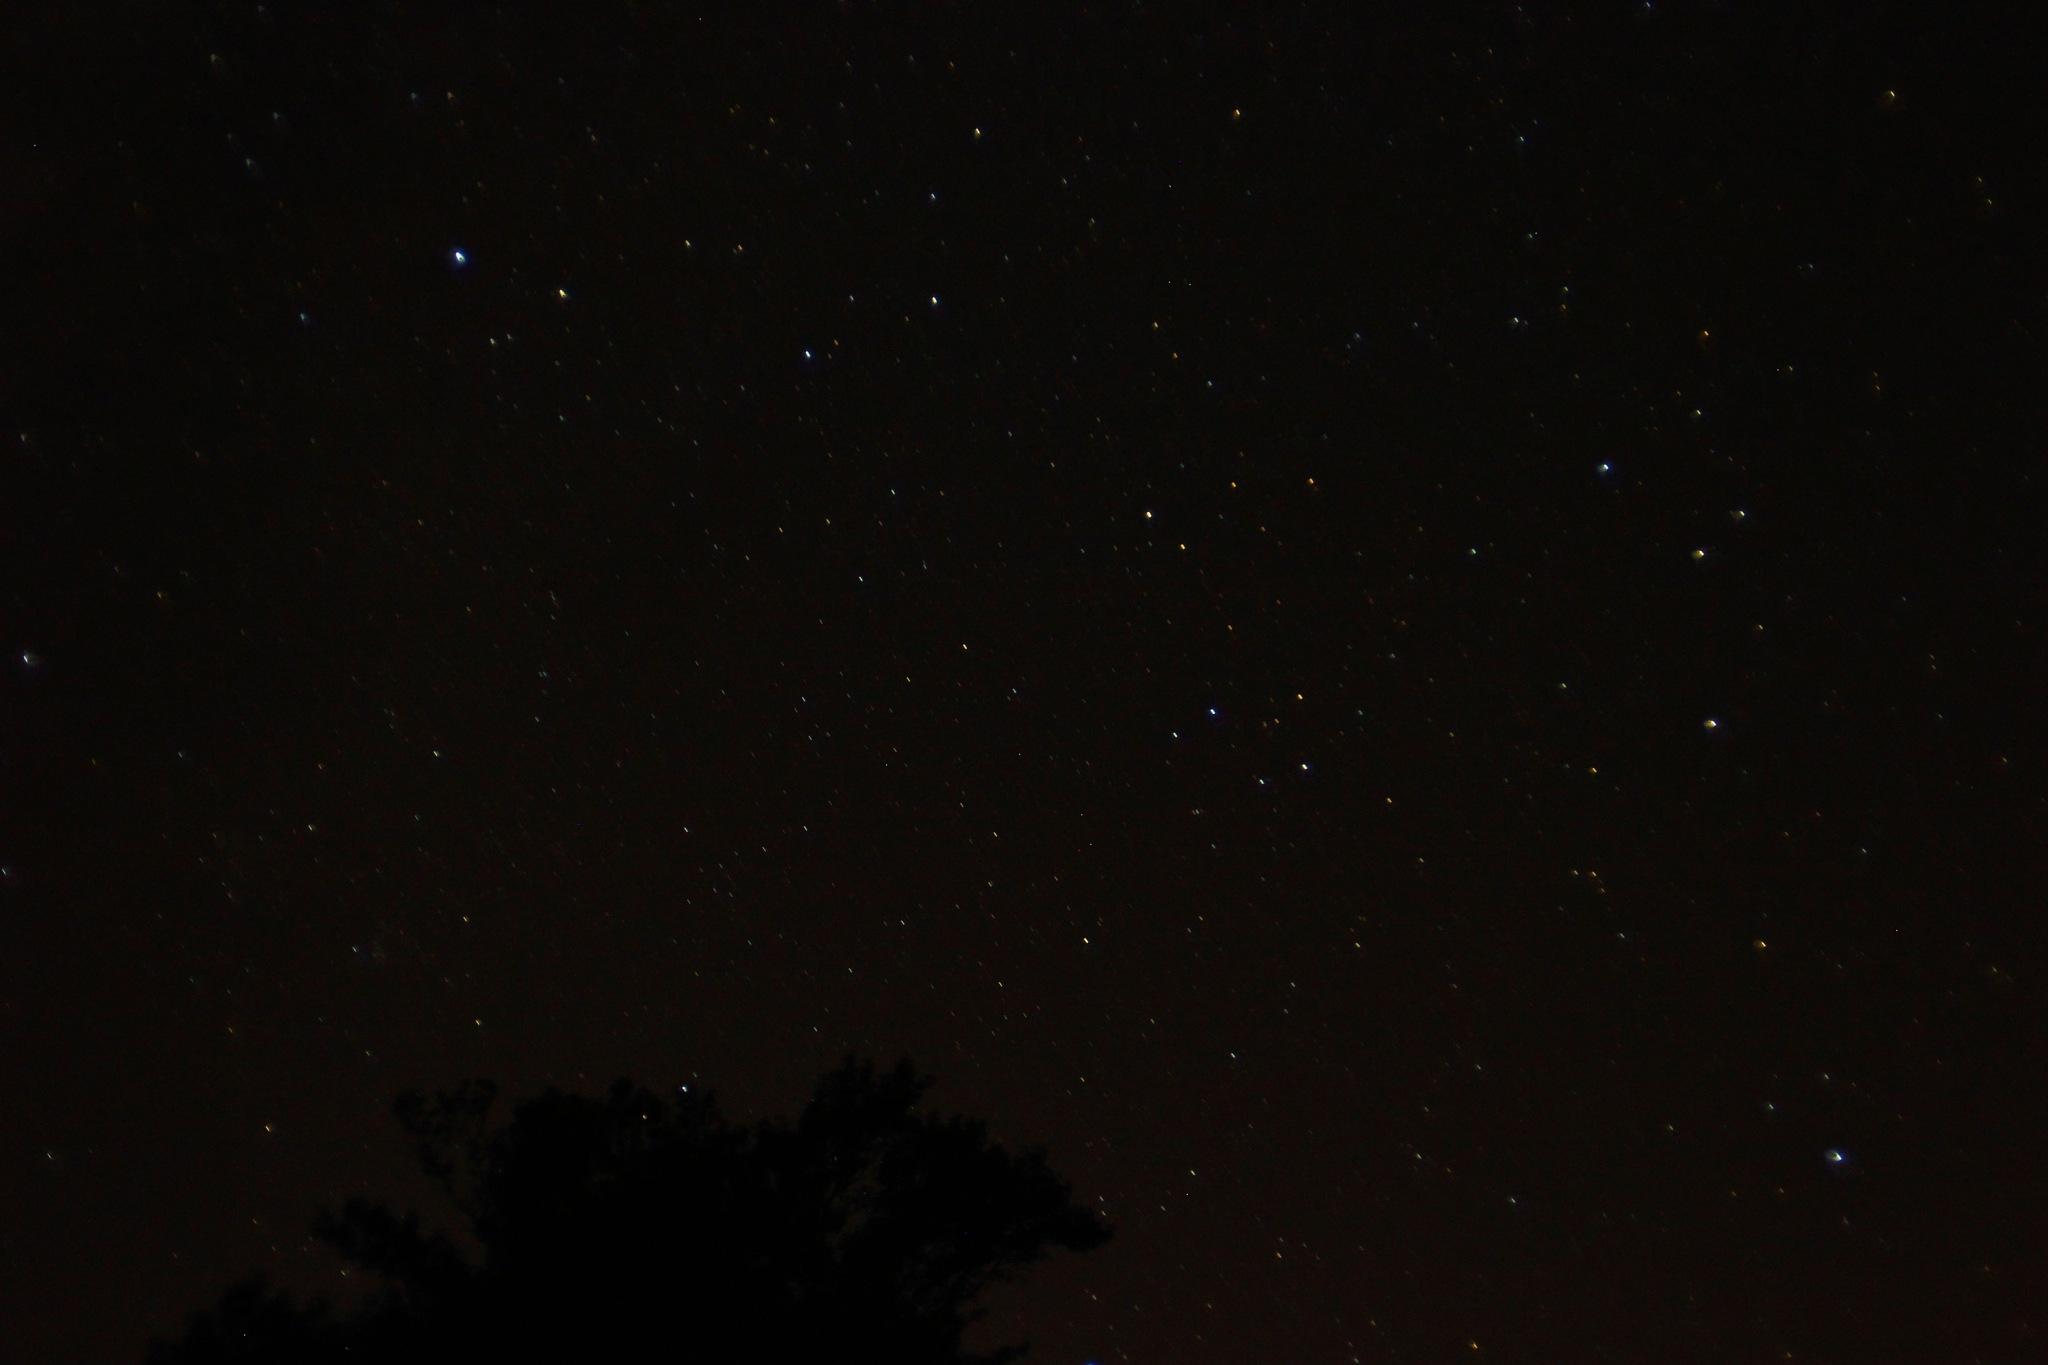 Perseid Meteor Shower by jdwines